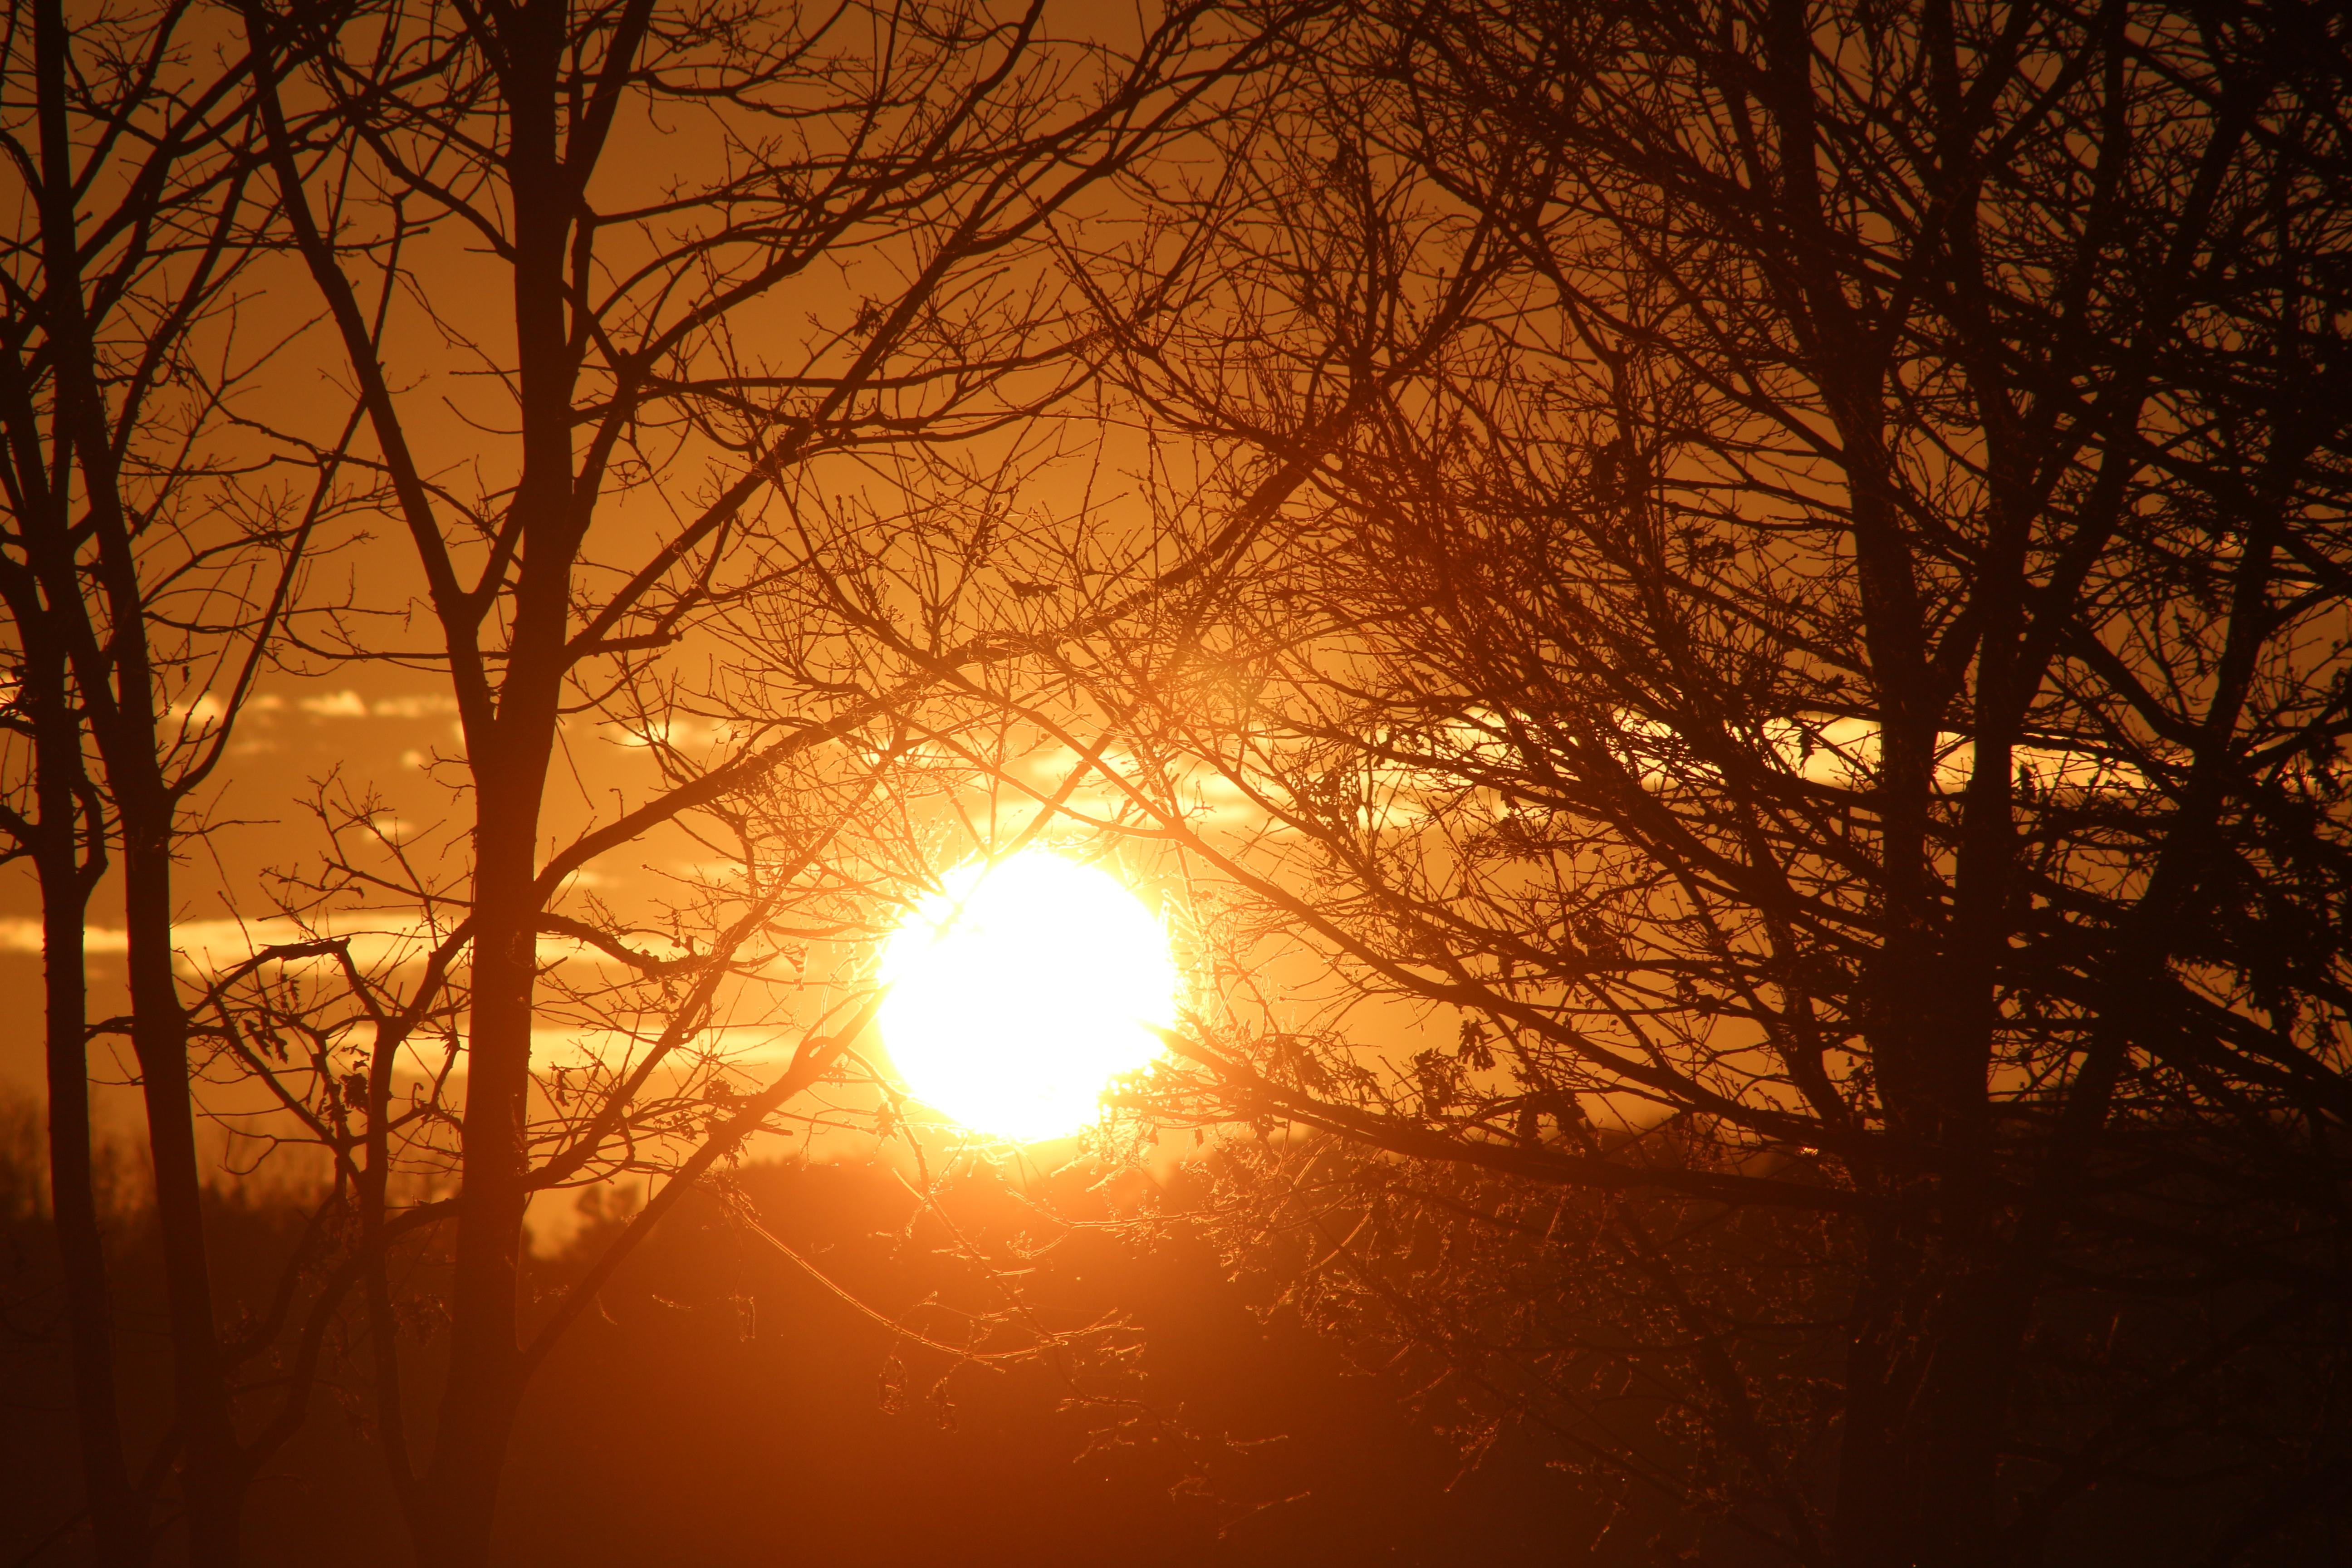 Free Images Sunset Sun Sunrise Branch Atmosphere